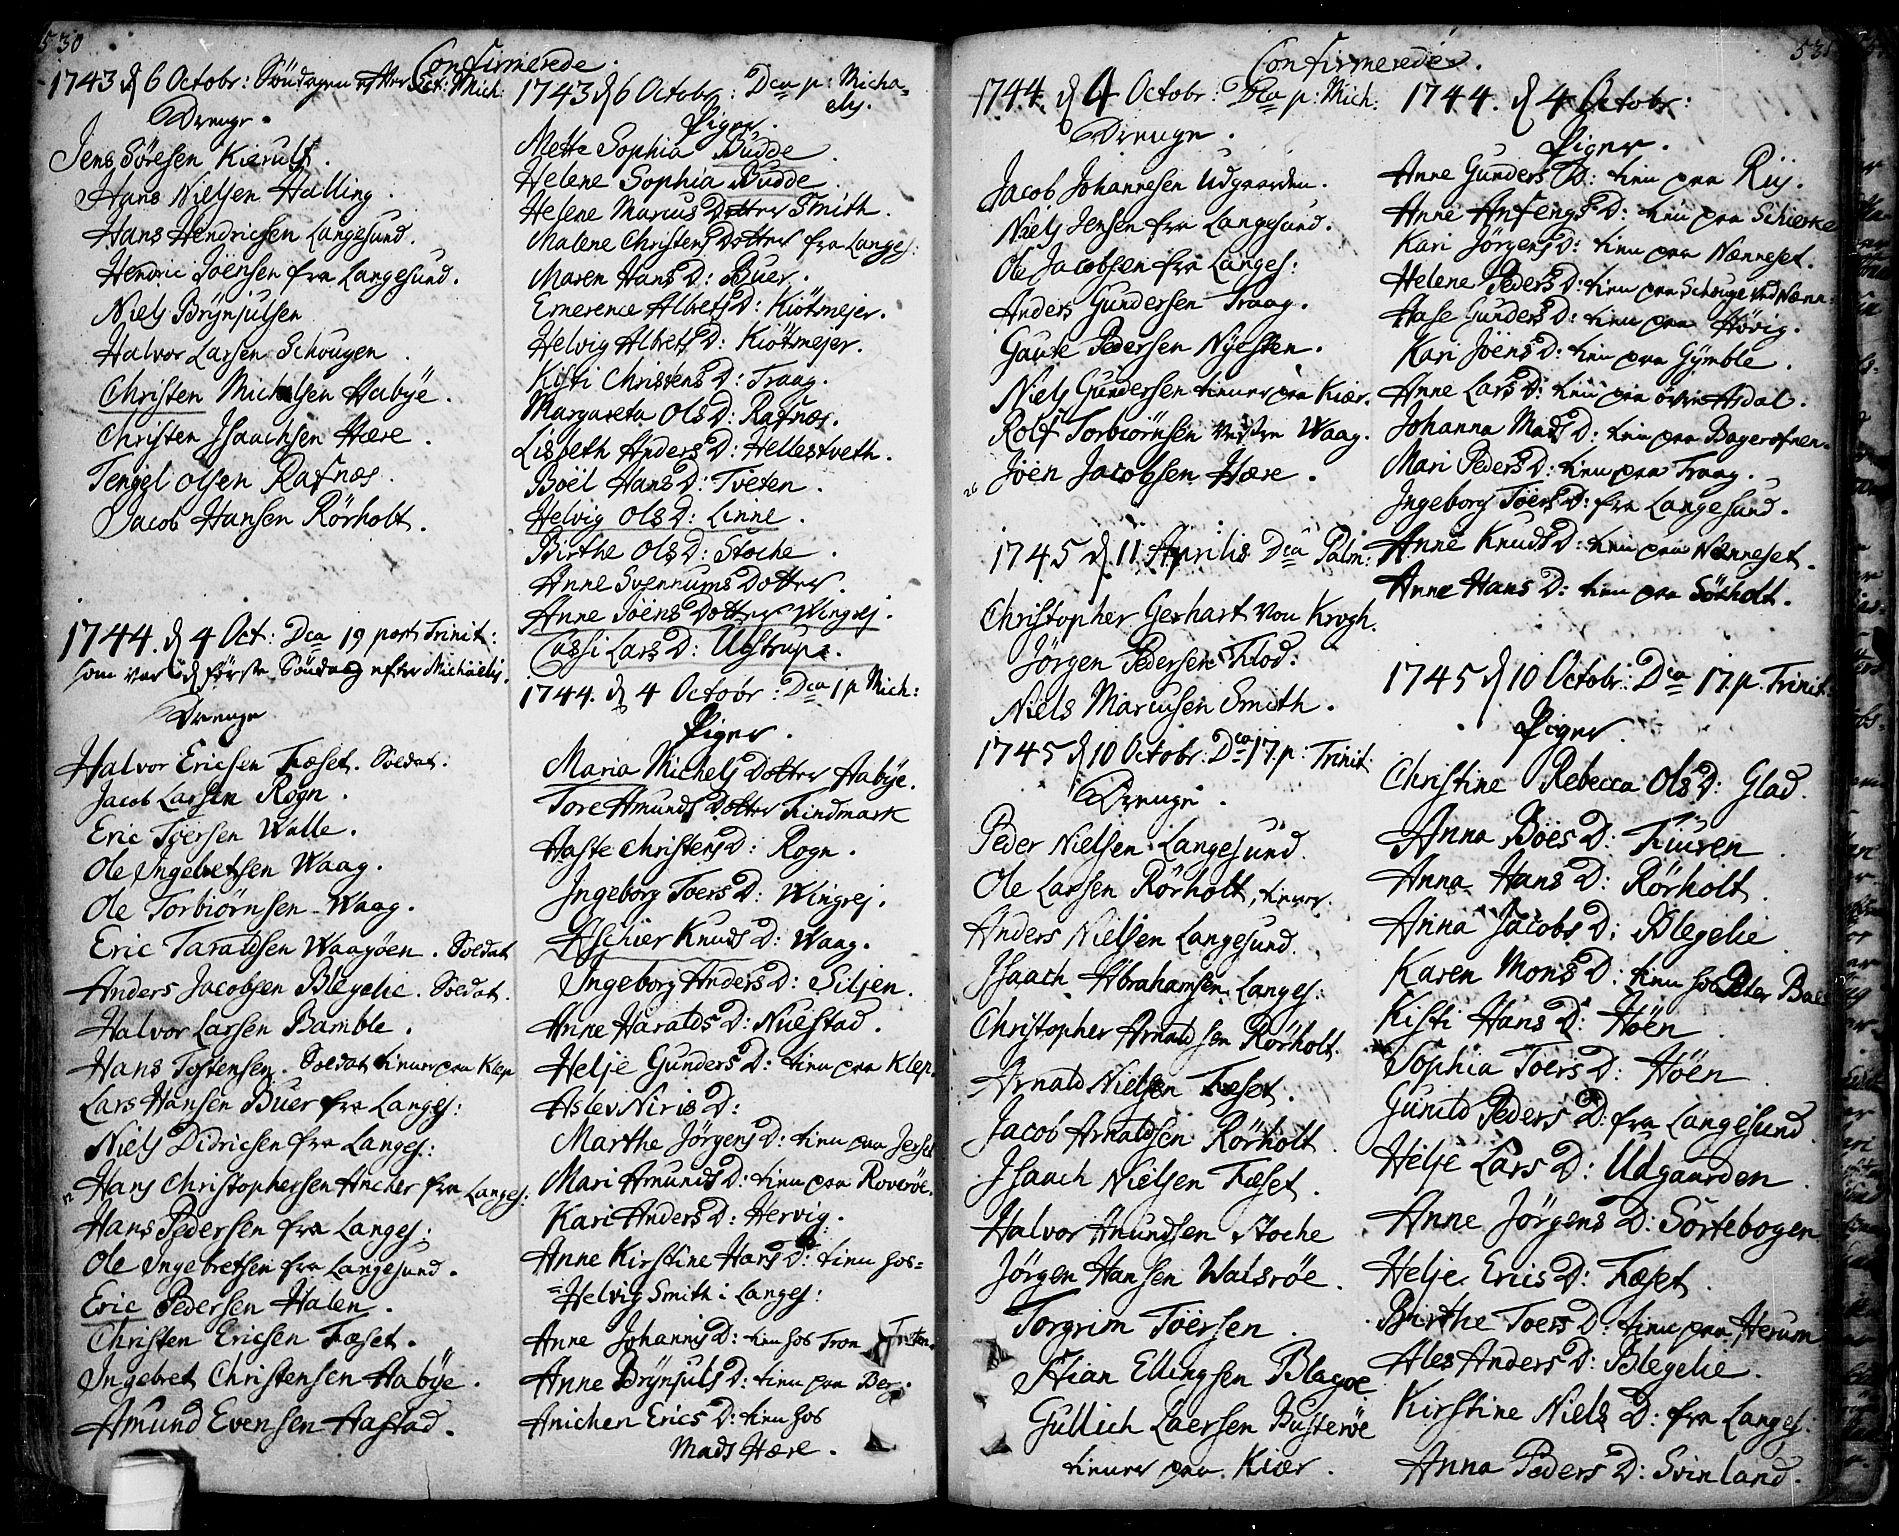 SAKO, Bamble kirkebøker, F/Fa/L0001: Ministerialbok nr. I 1, 1702-1774, s. 530-531